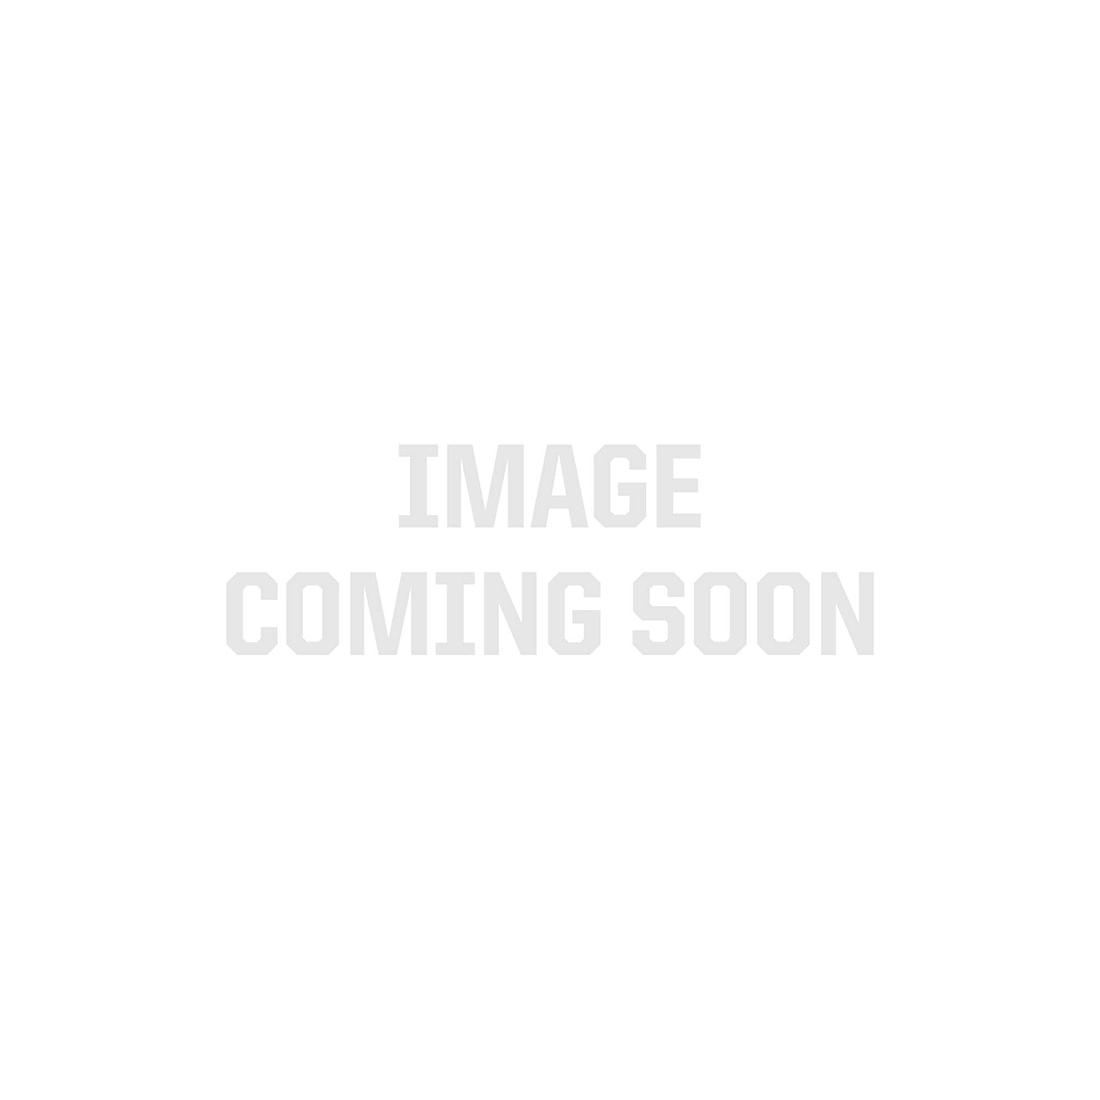 UltraSlim 2016 LED Strip Light - 6,500K - 120/m - 5m Reel